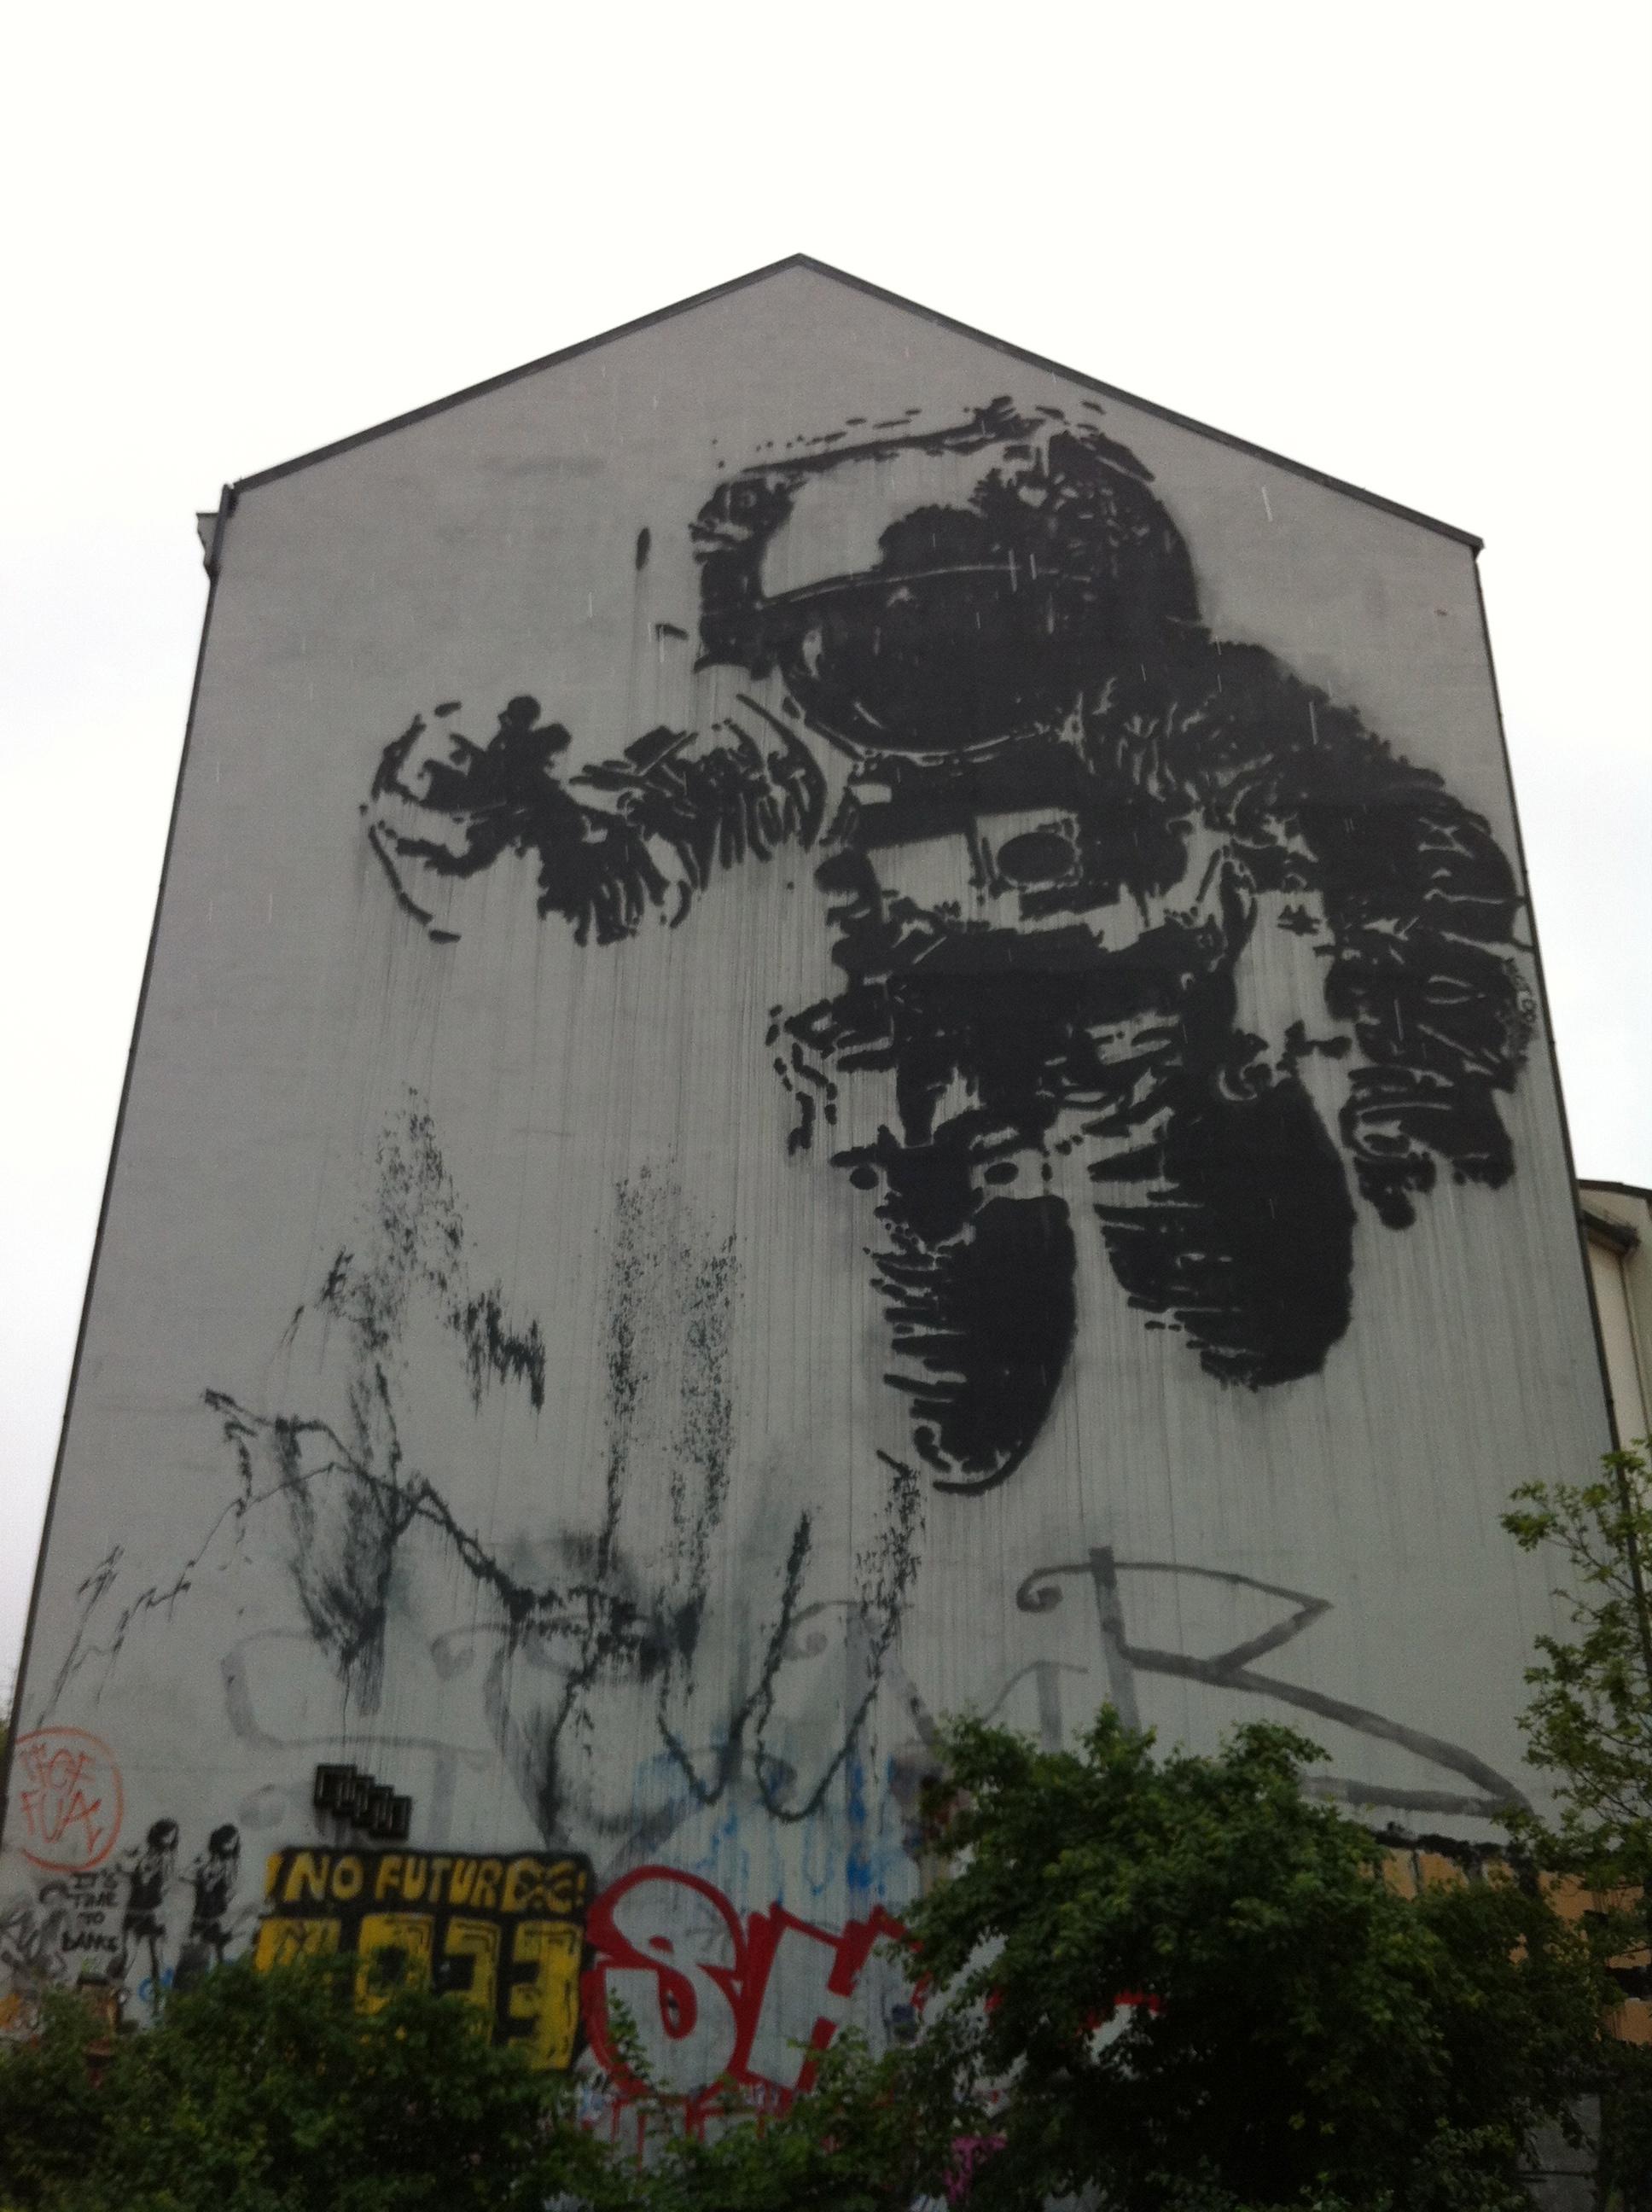 Victor Ash - Astronaut Berlin